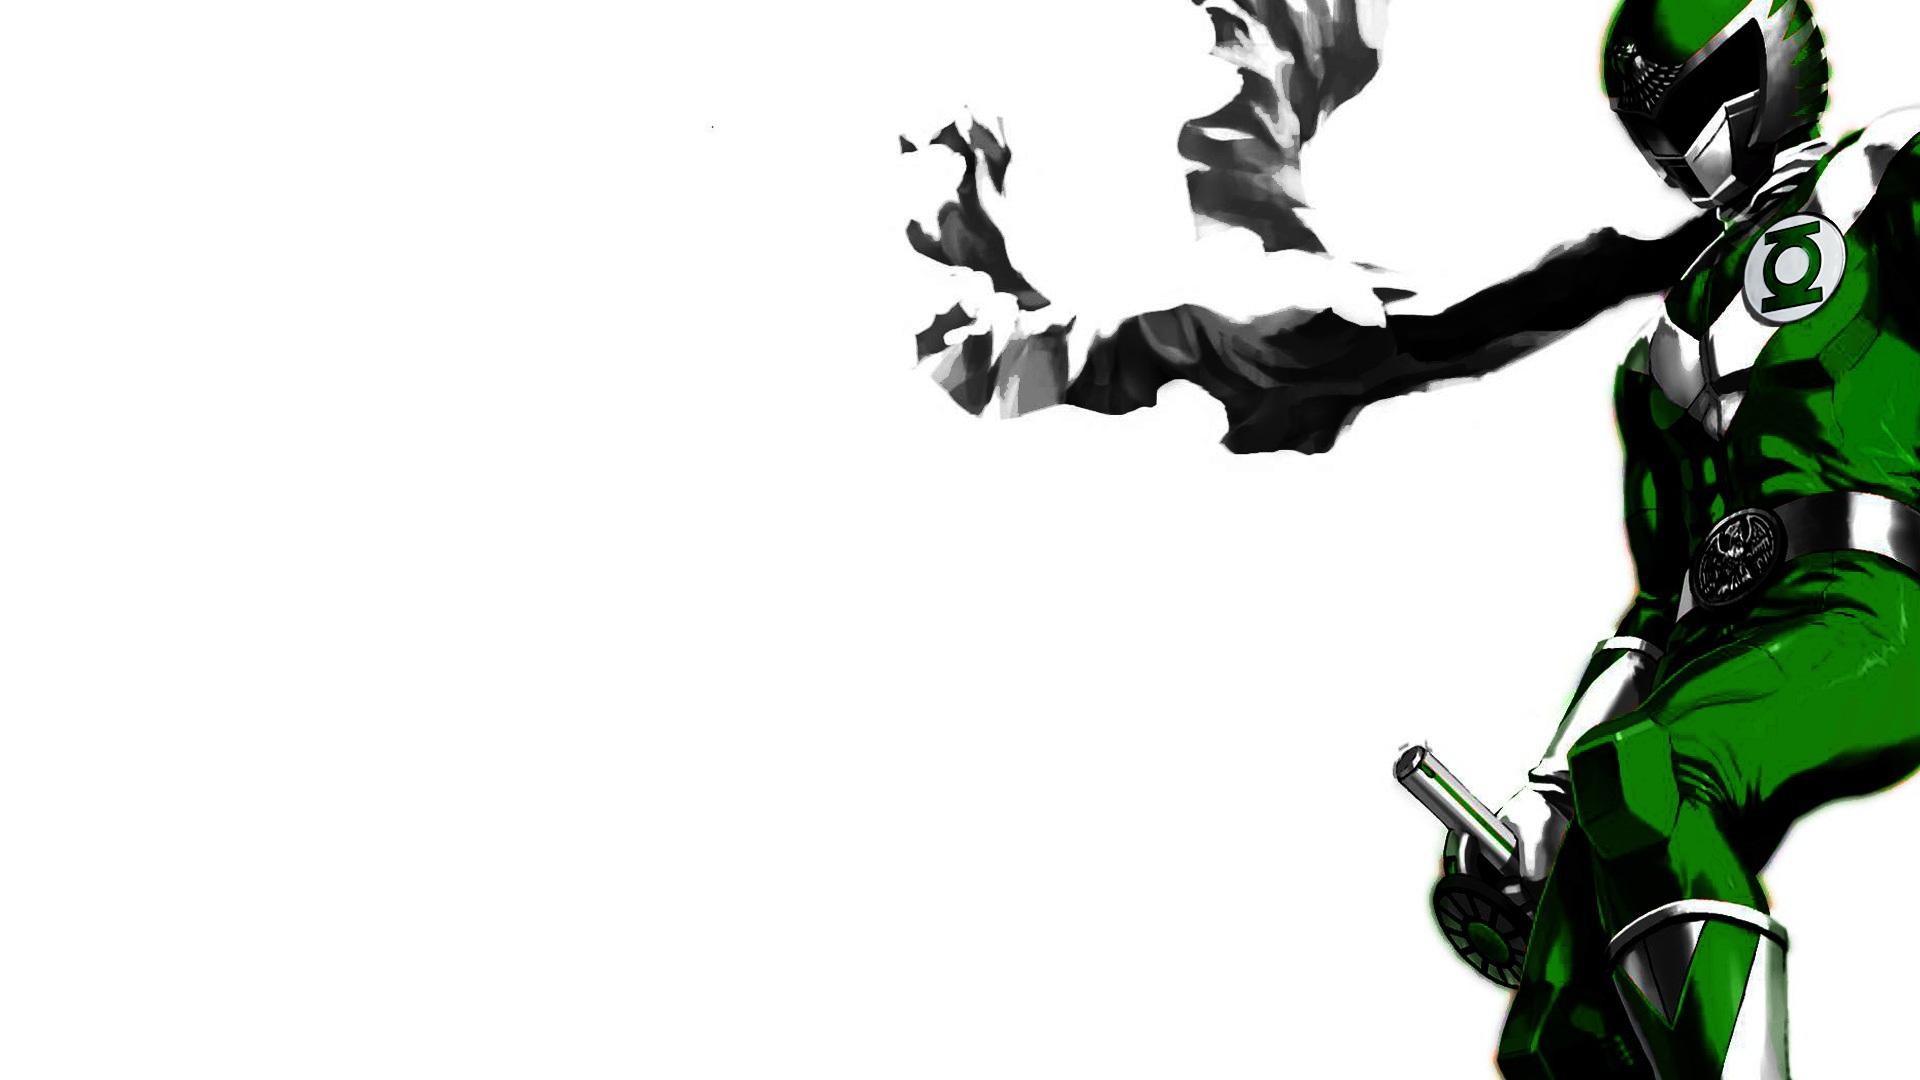 White Ranger Wallpaper - WallpaperSafari